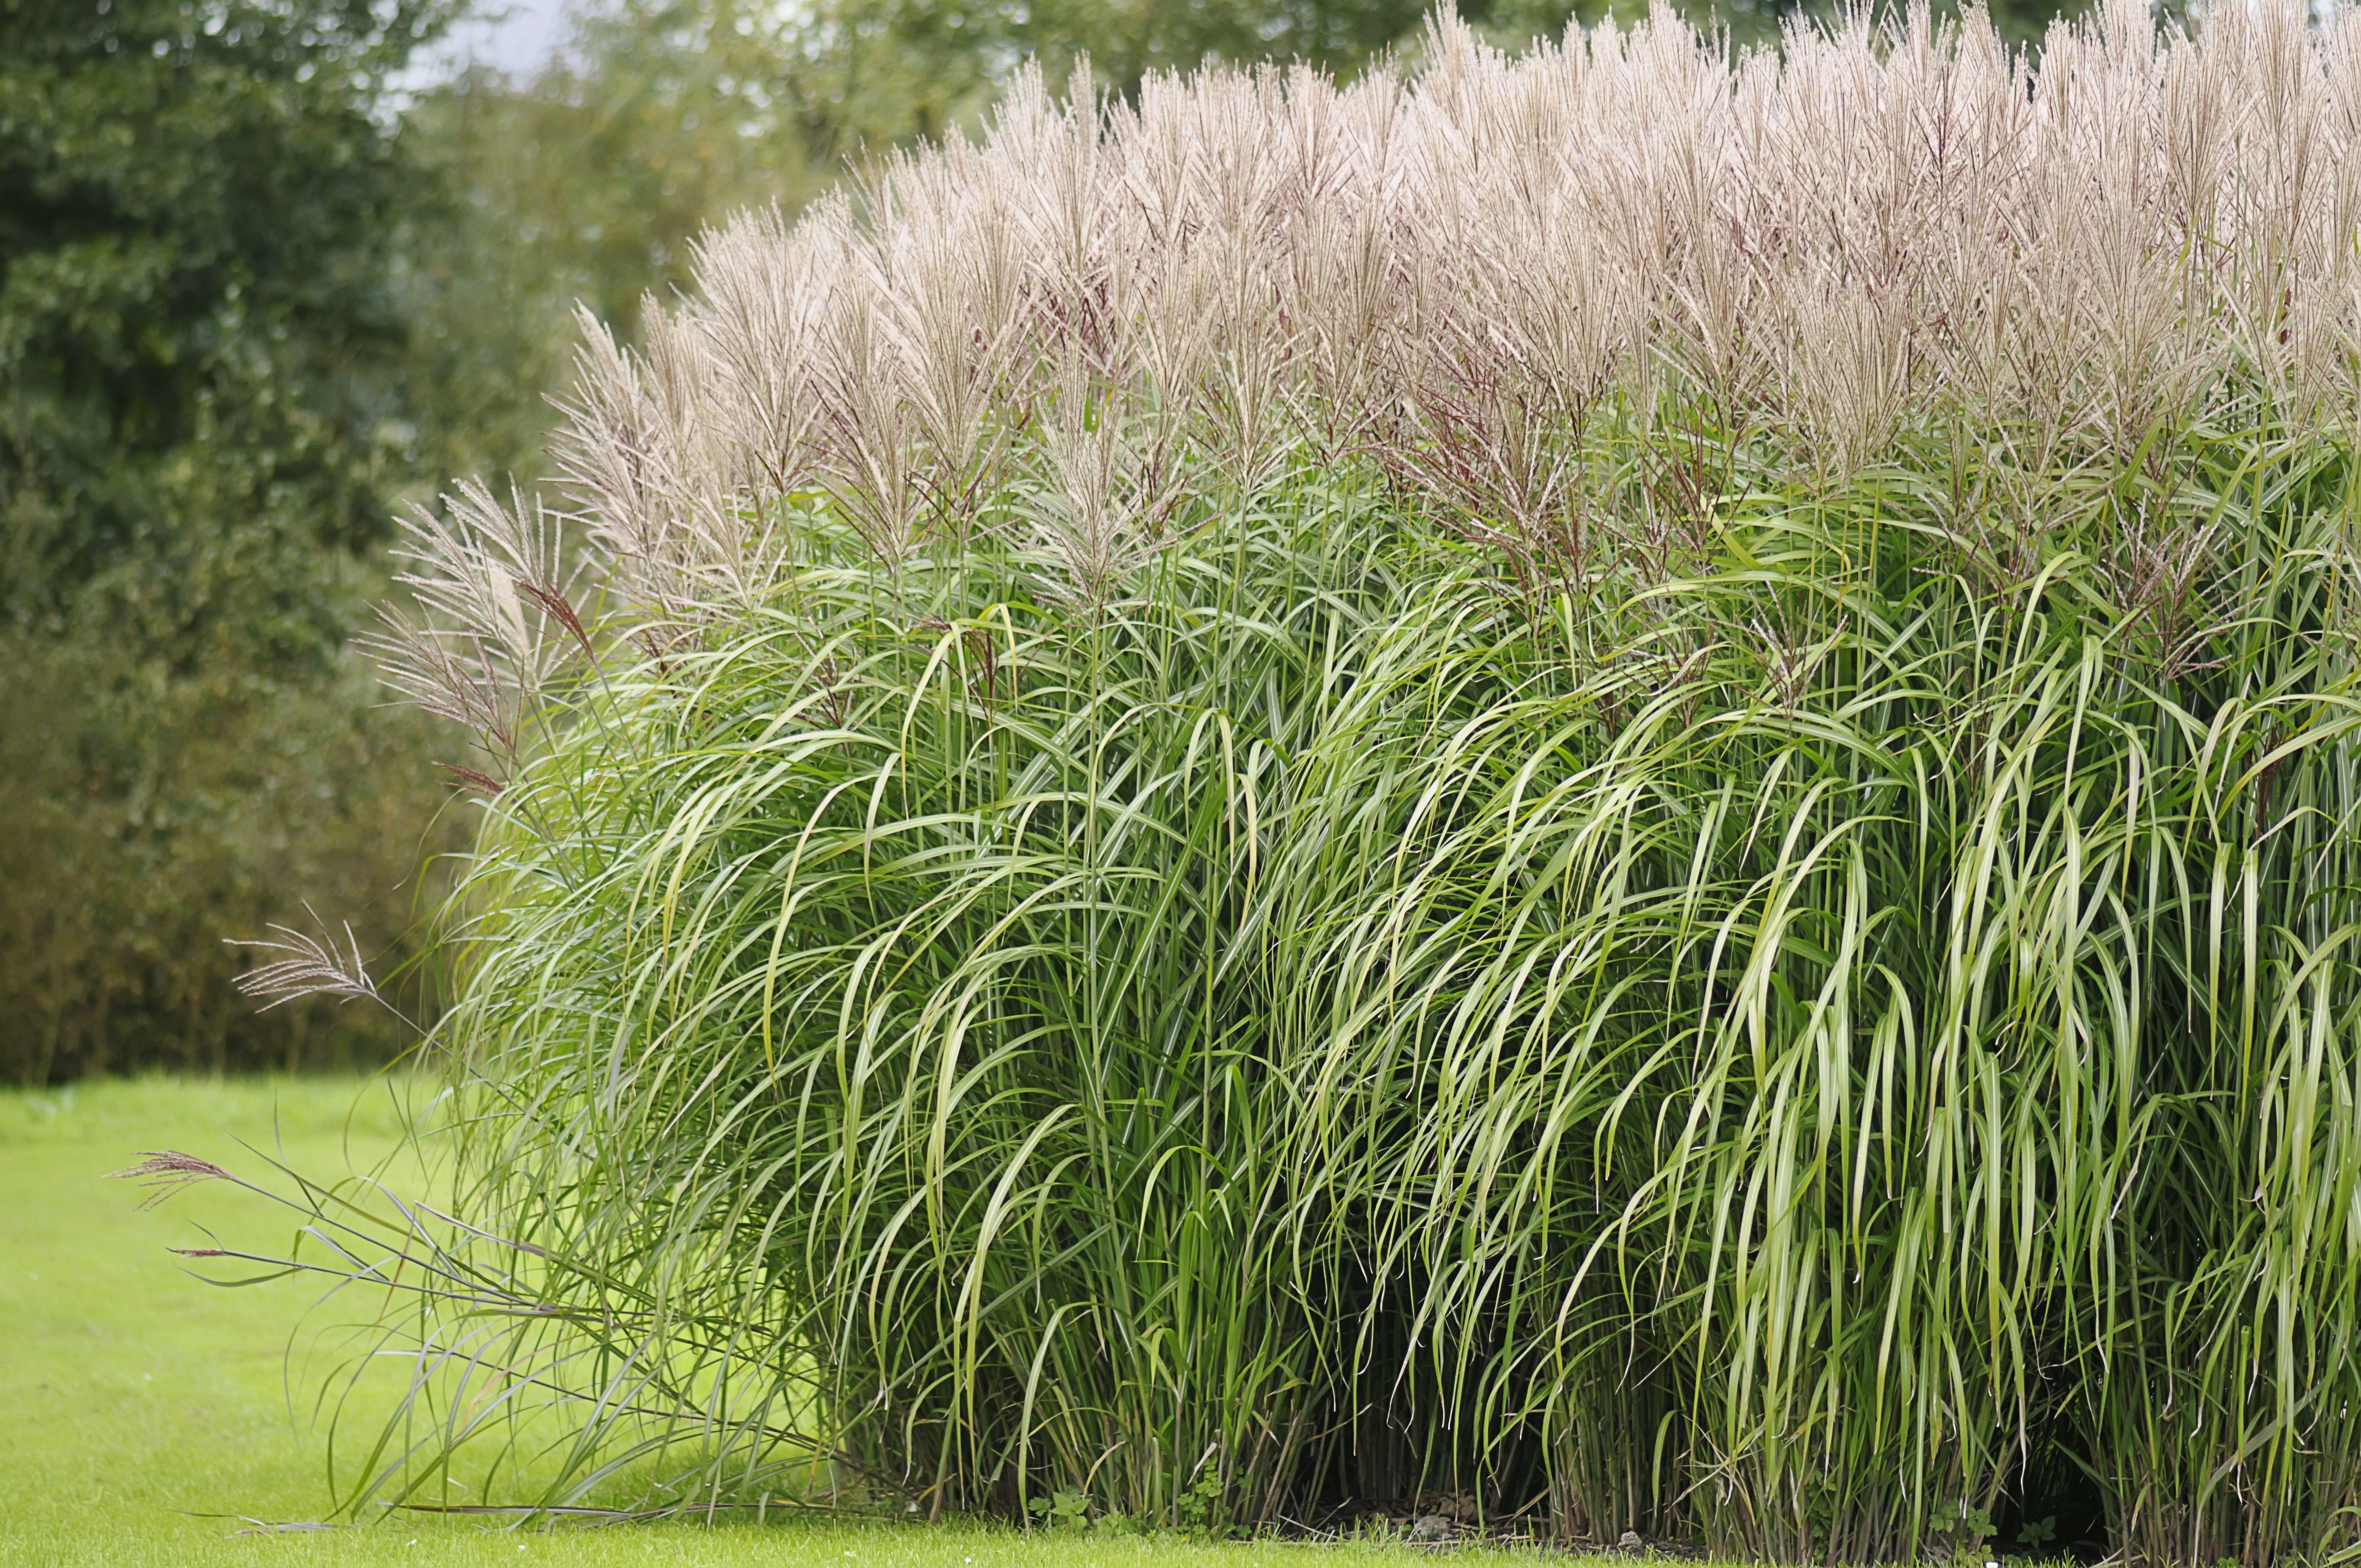 Japanese Silver Grass Colorado Google Search Ornamental Grasses For Shade Ornamental Grasses Grasses Landscaping